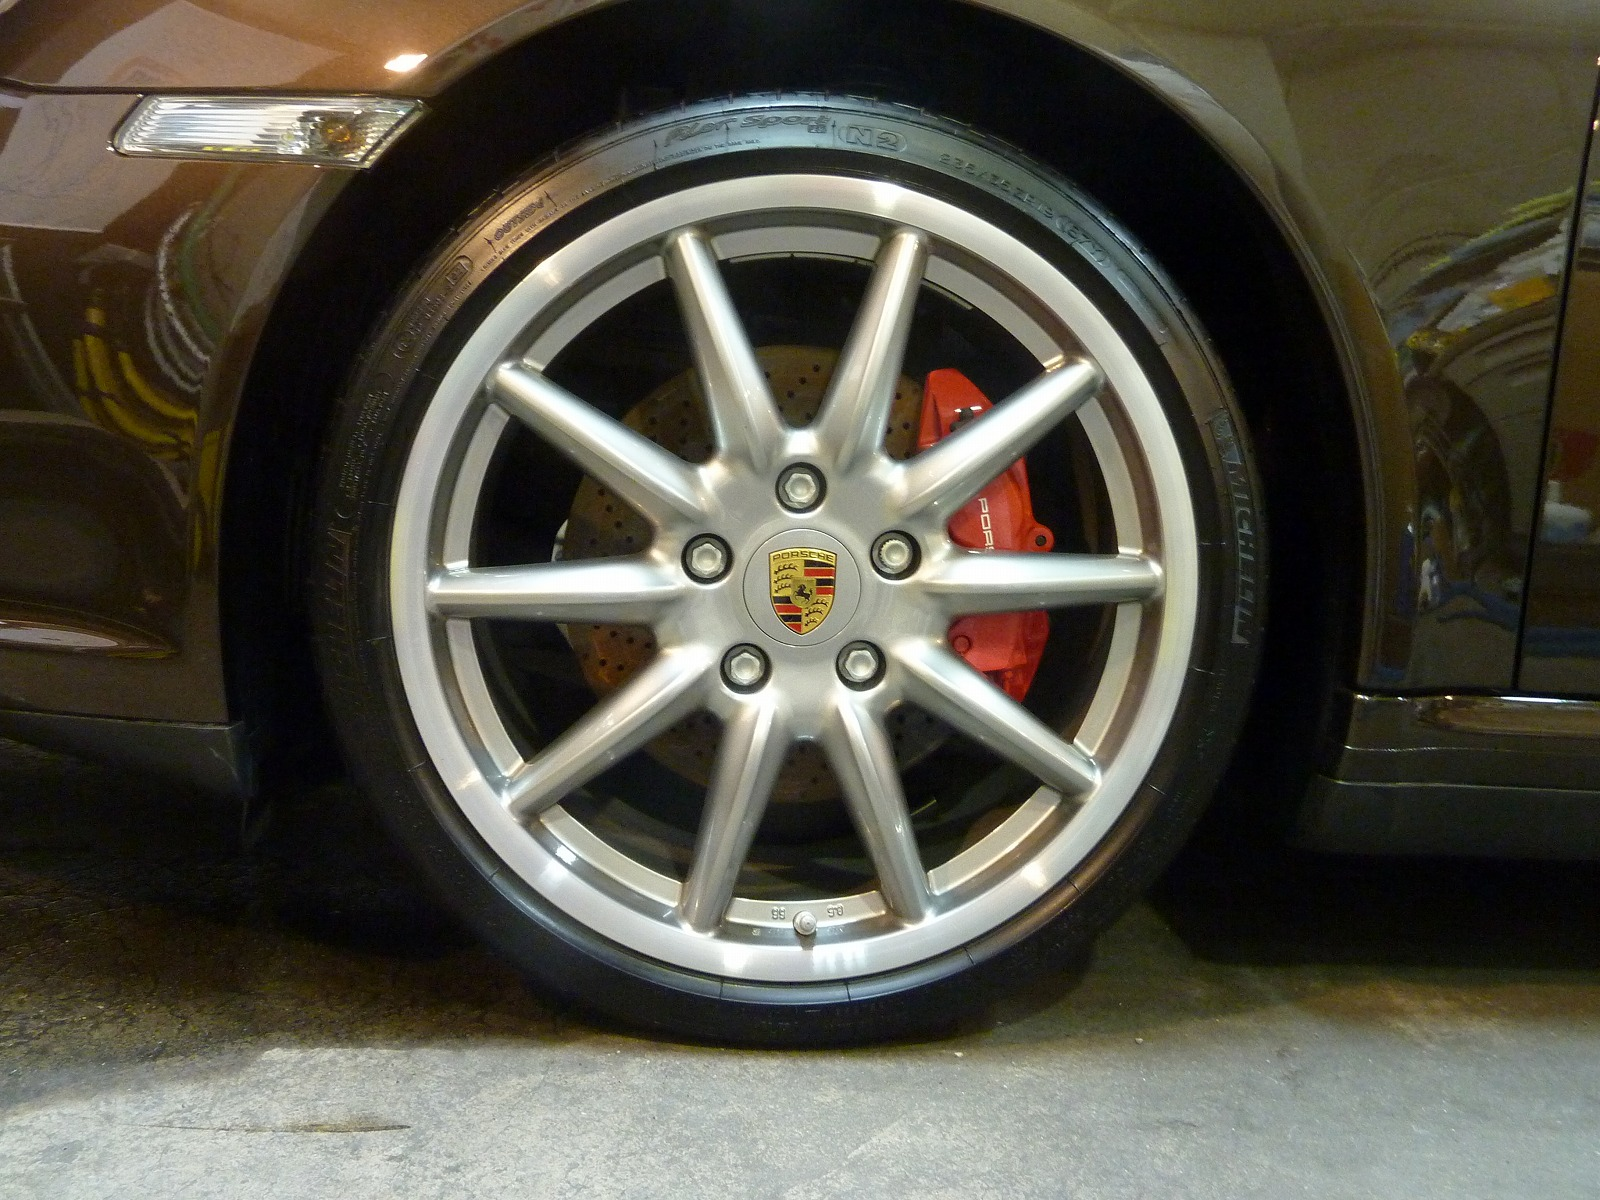 20140428-porsche-911-carrera4s-cabriolet-11